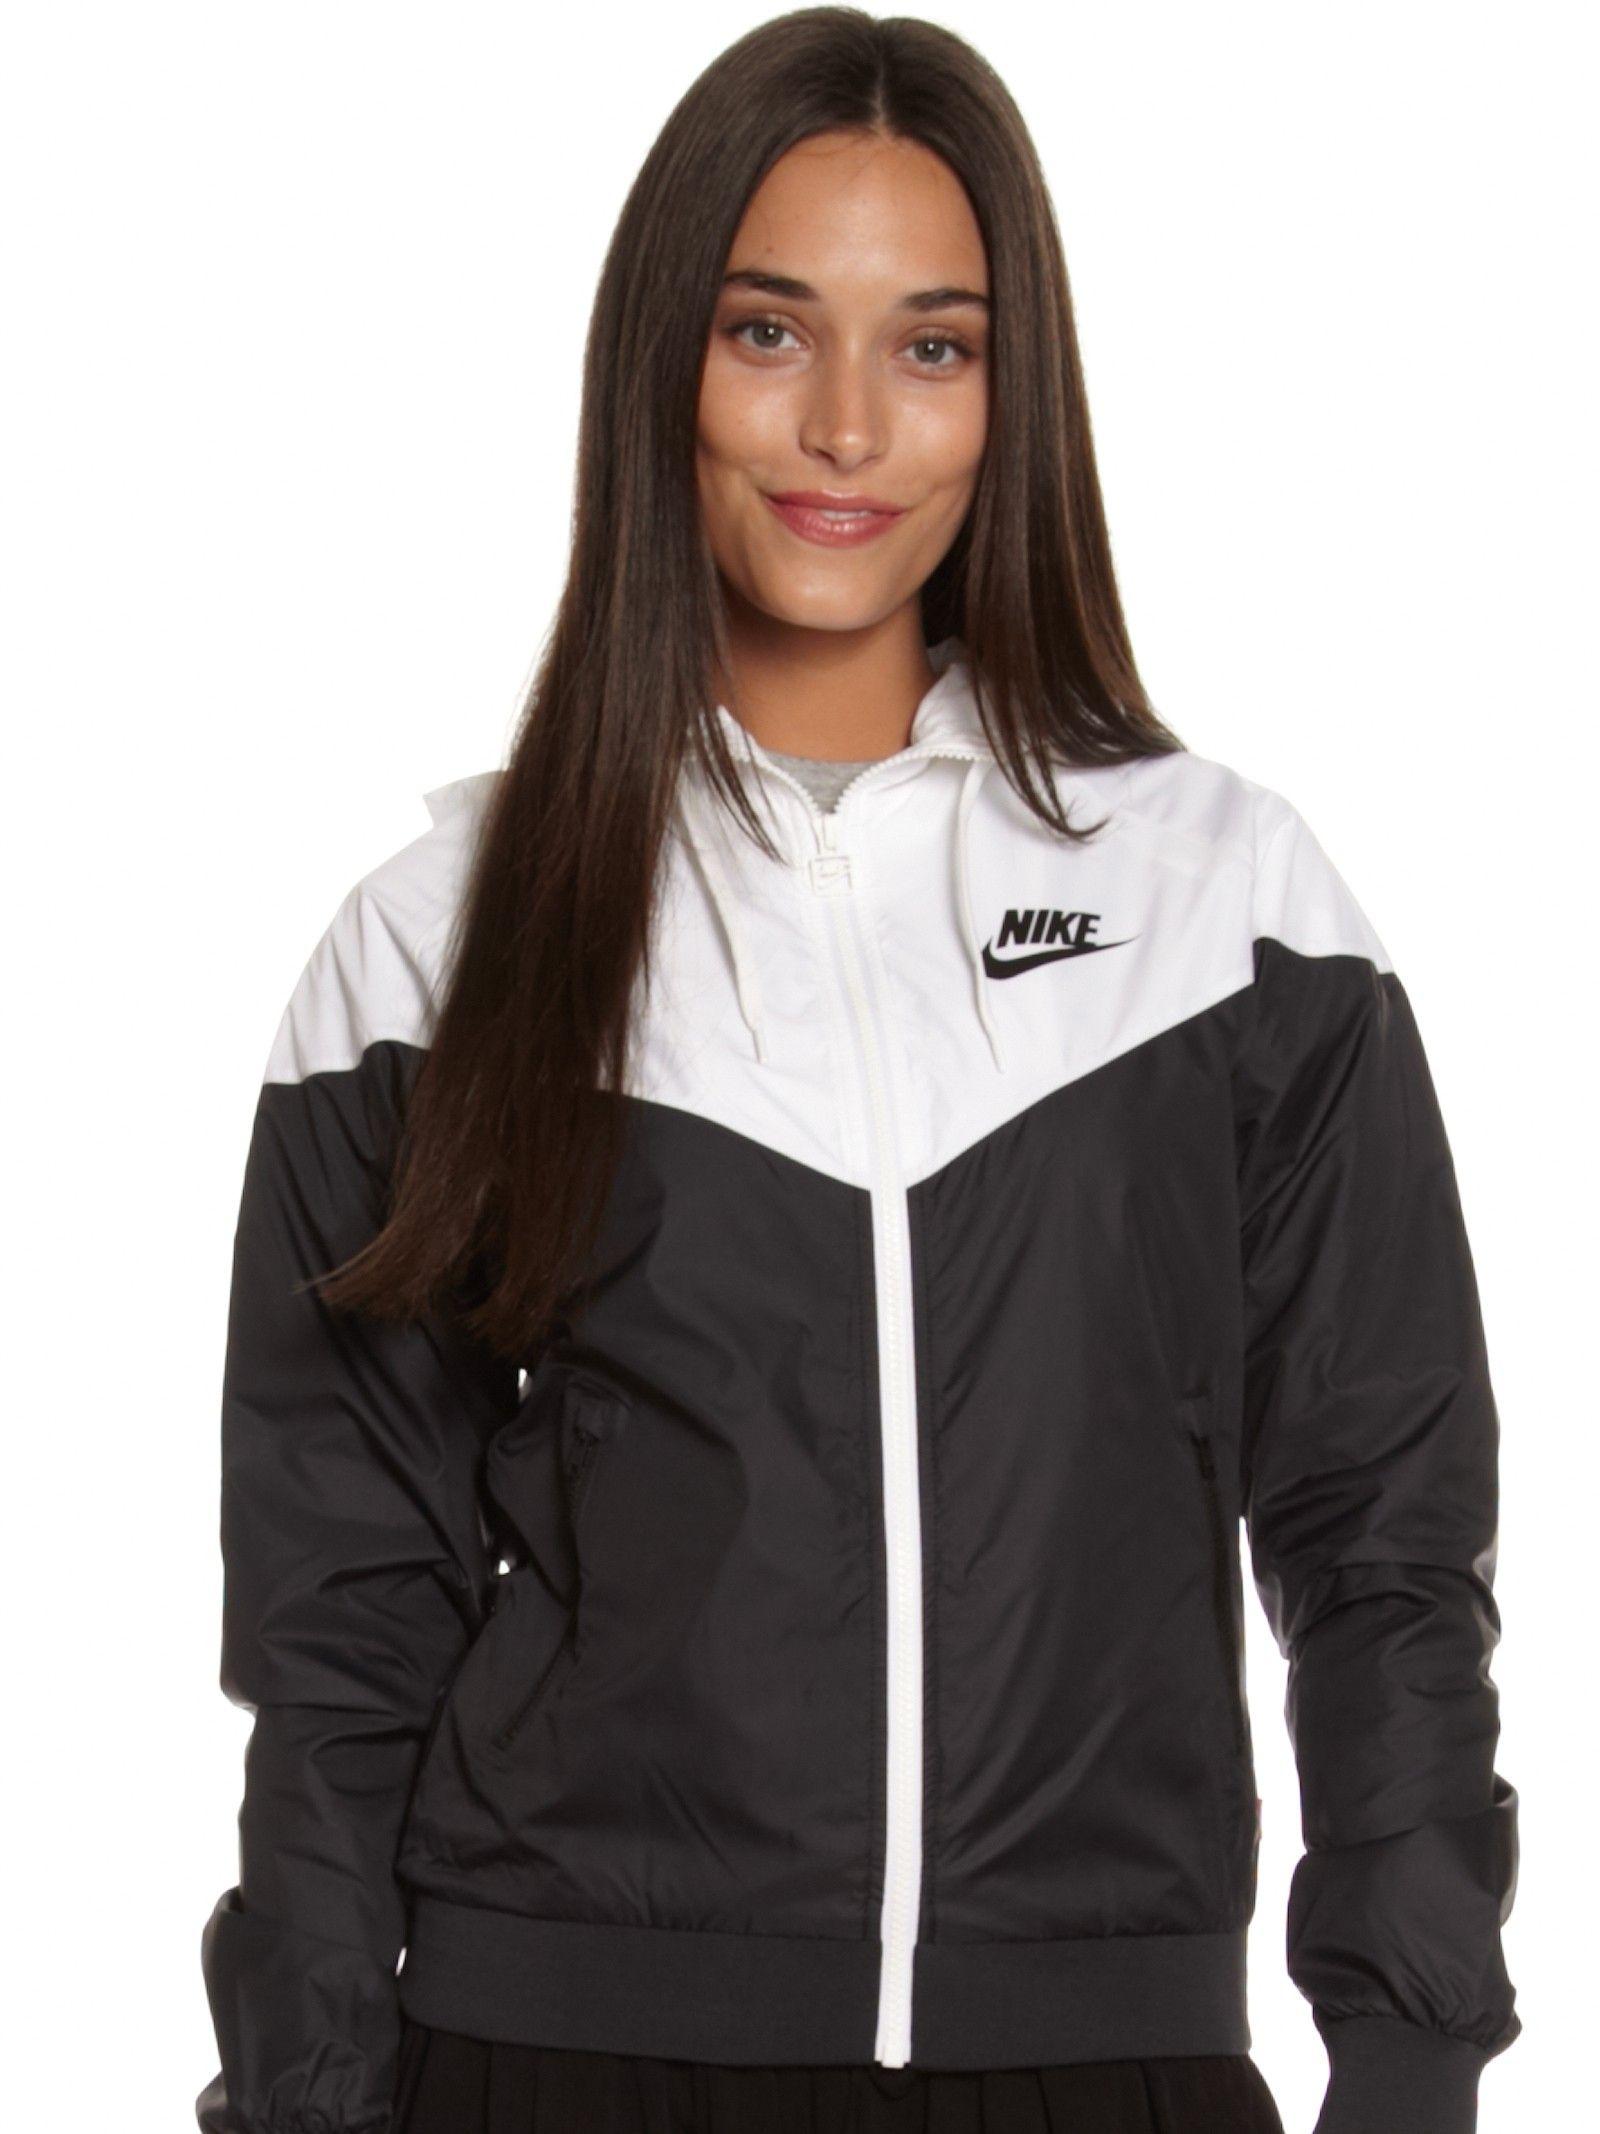 Nike epic jacket - Windrunner Jacket In Black White